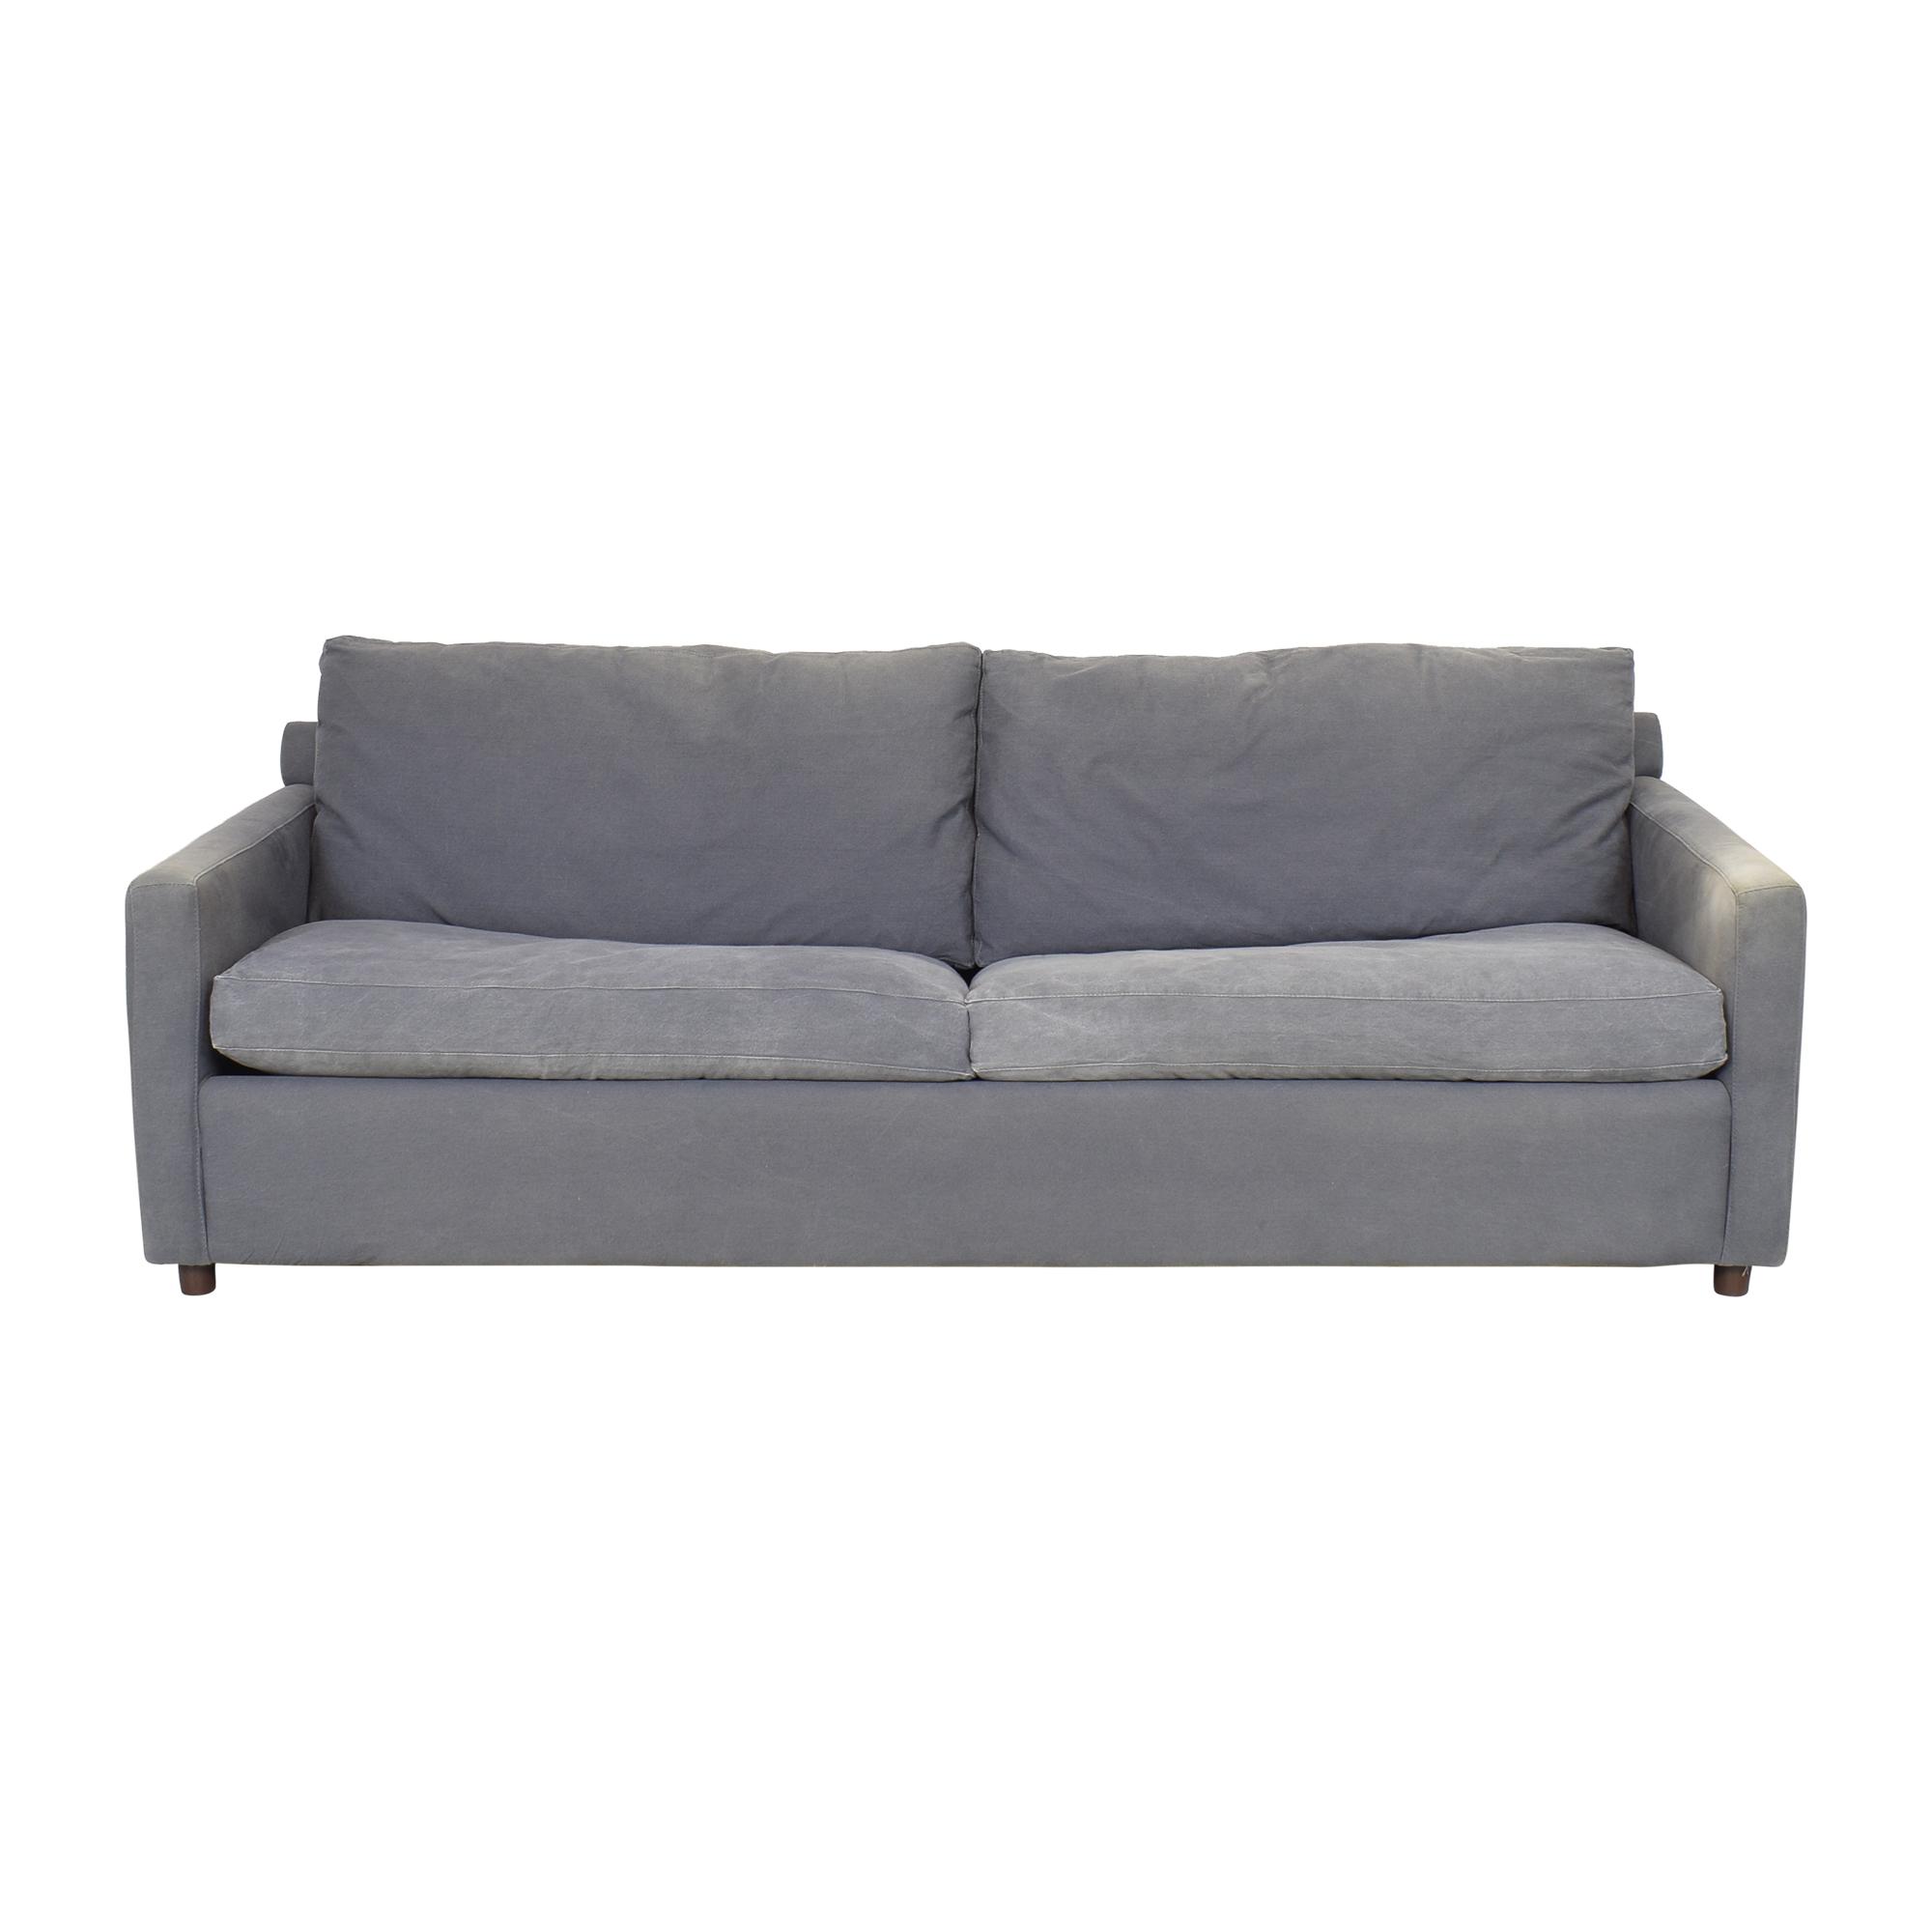 buy ABC Carpet & Home Lucali Queen Sleeper Sofa ABC Carpet & Home Sofa Beds